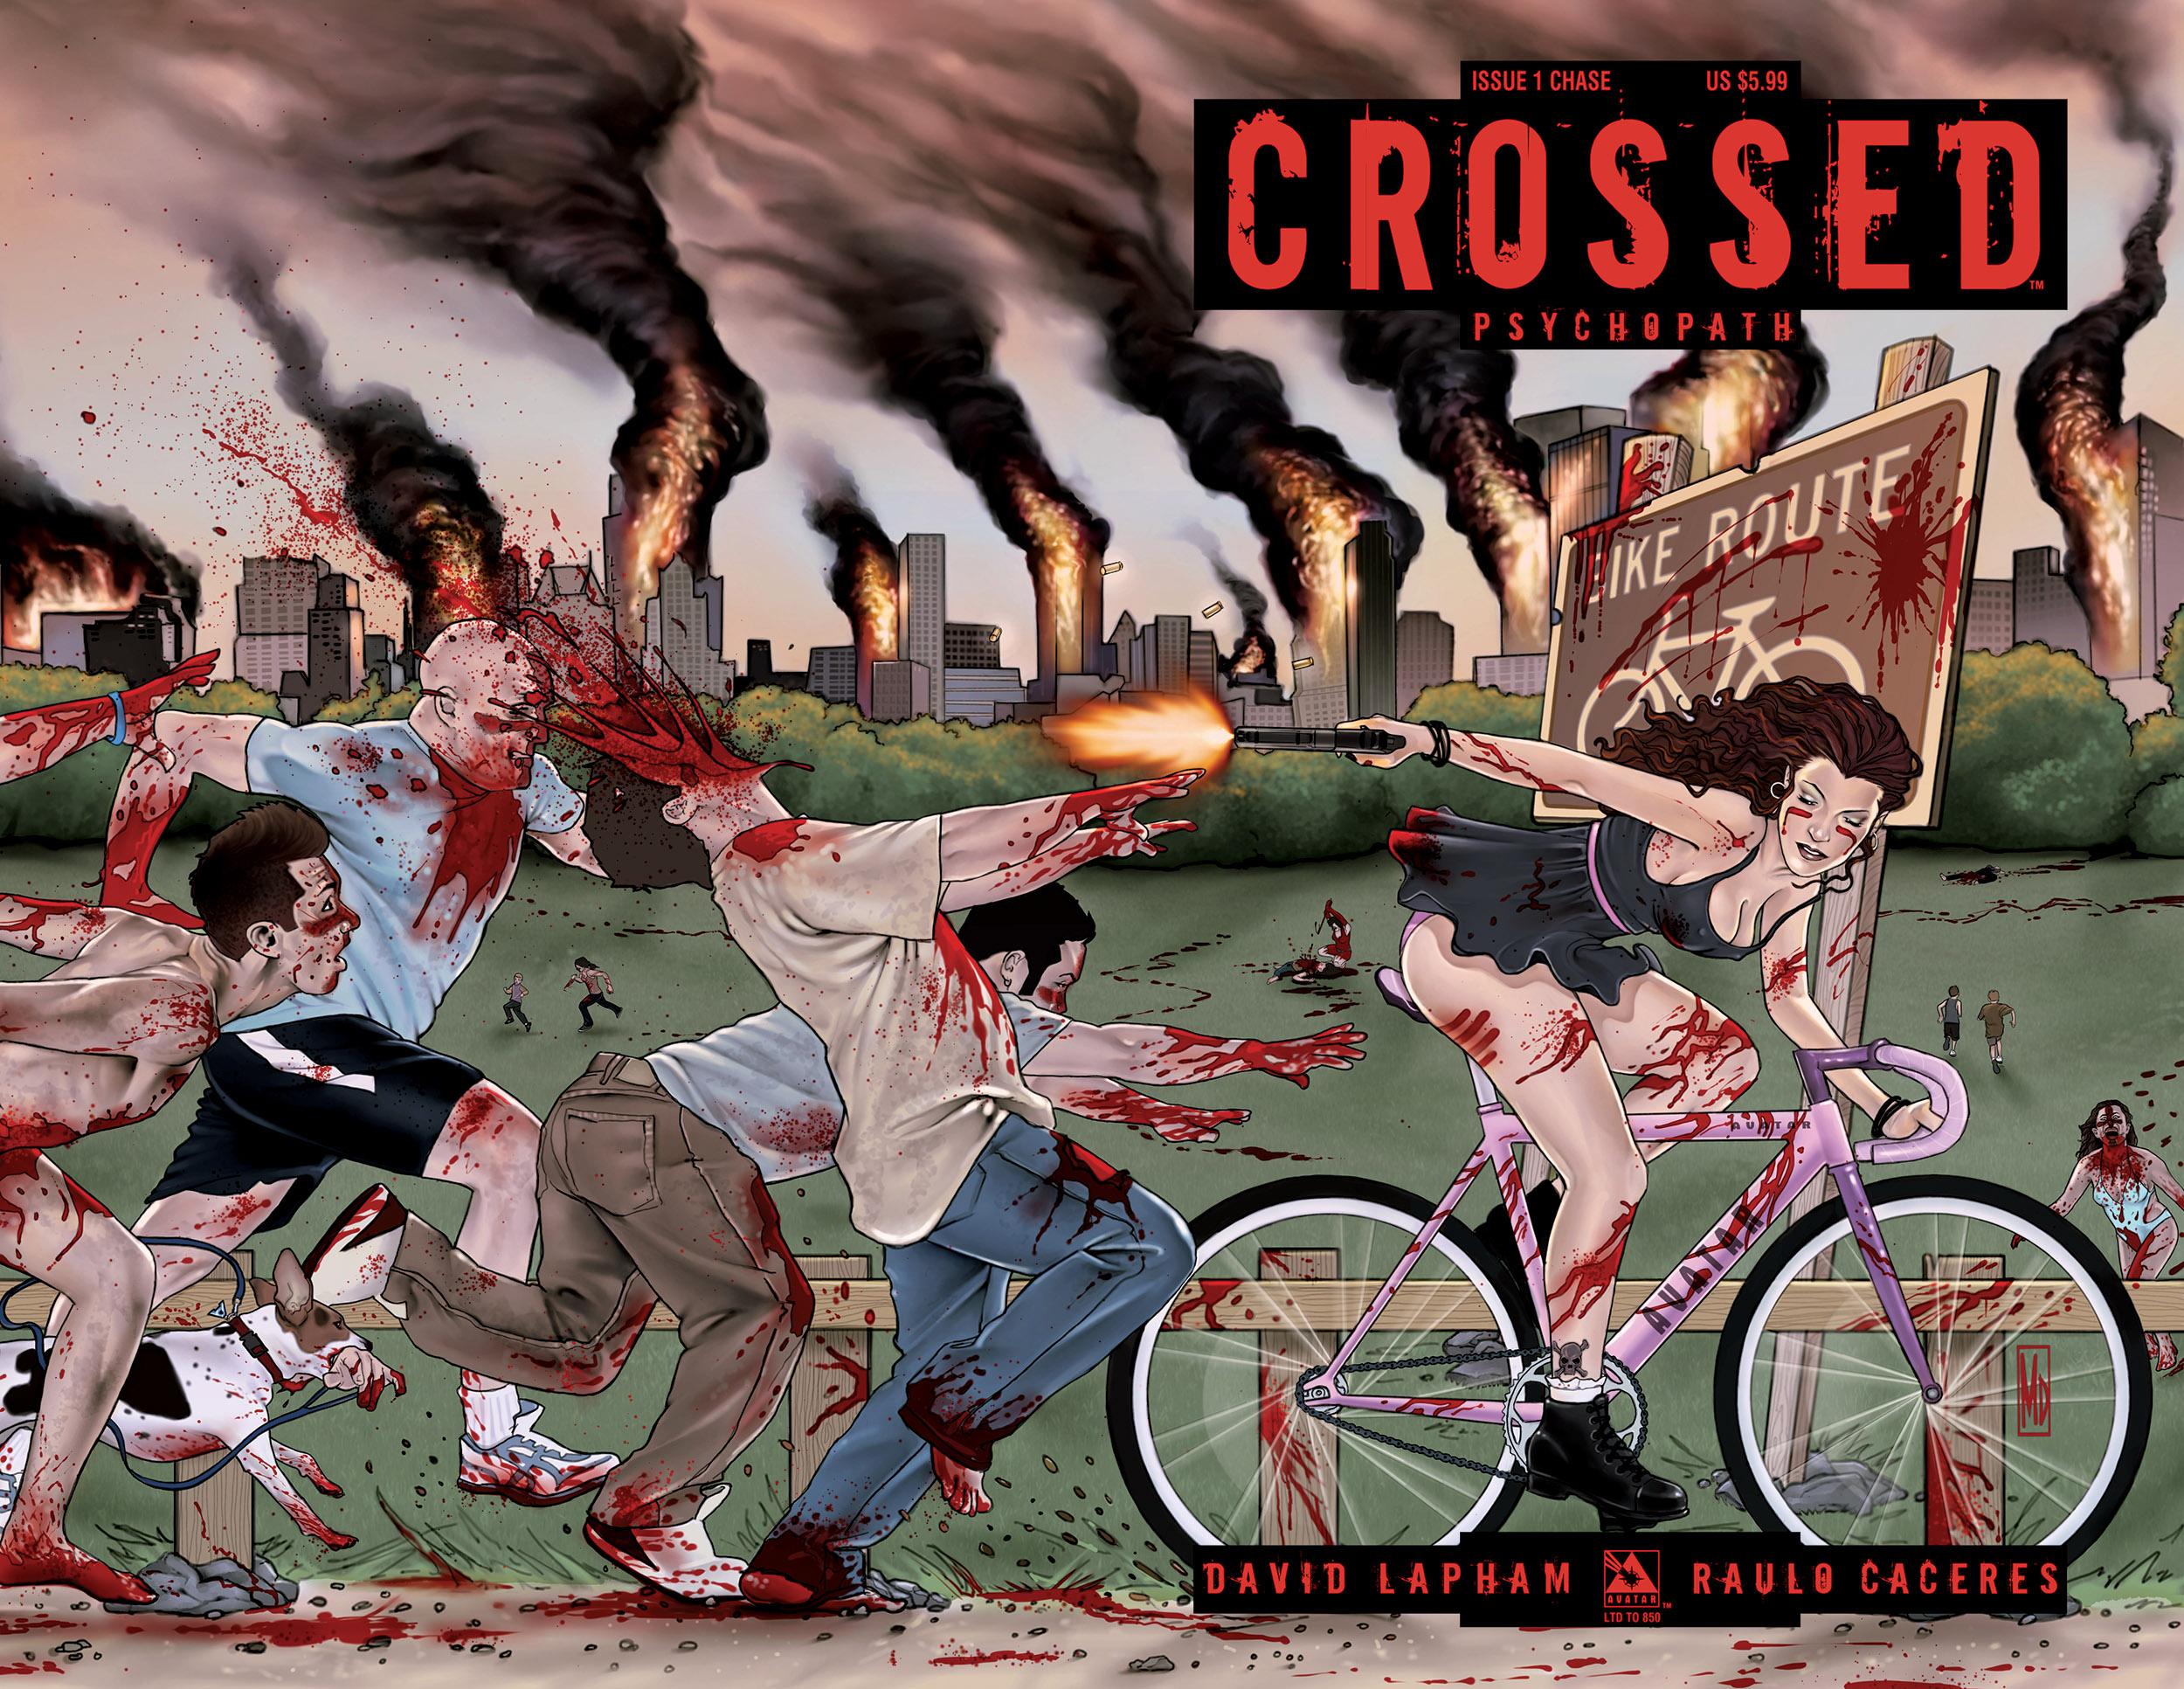 CrossedPsycho1Chase.jpg